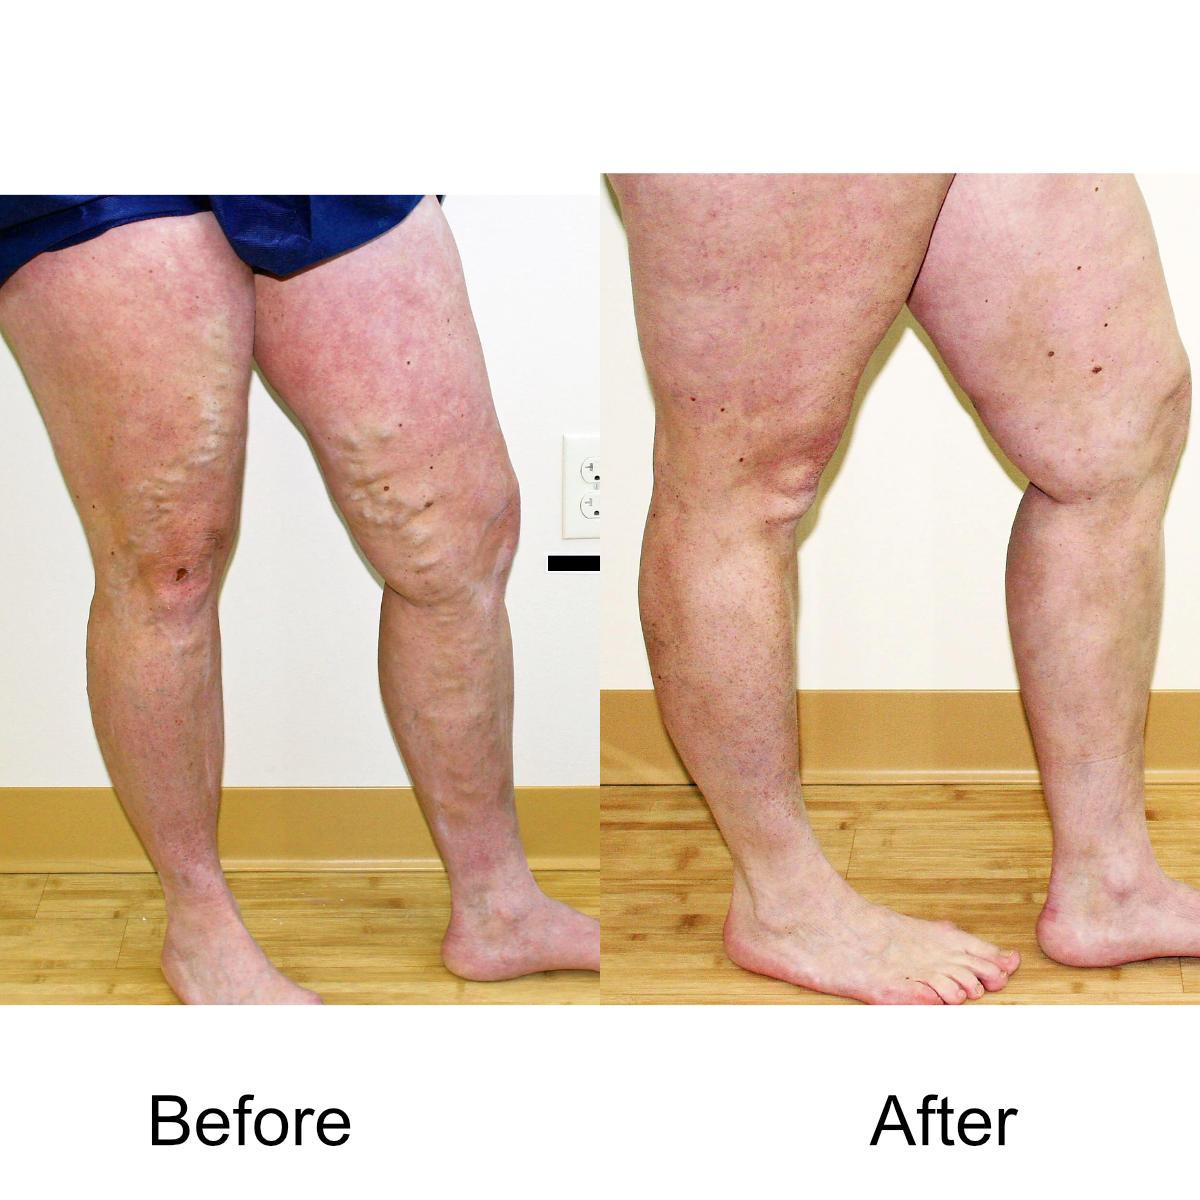 varicose-veins-comparison-14